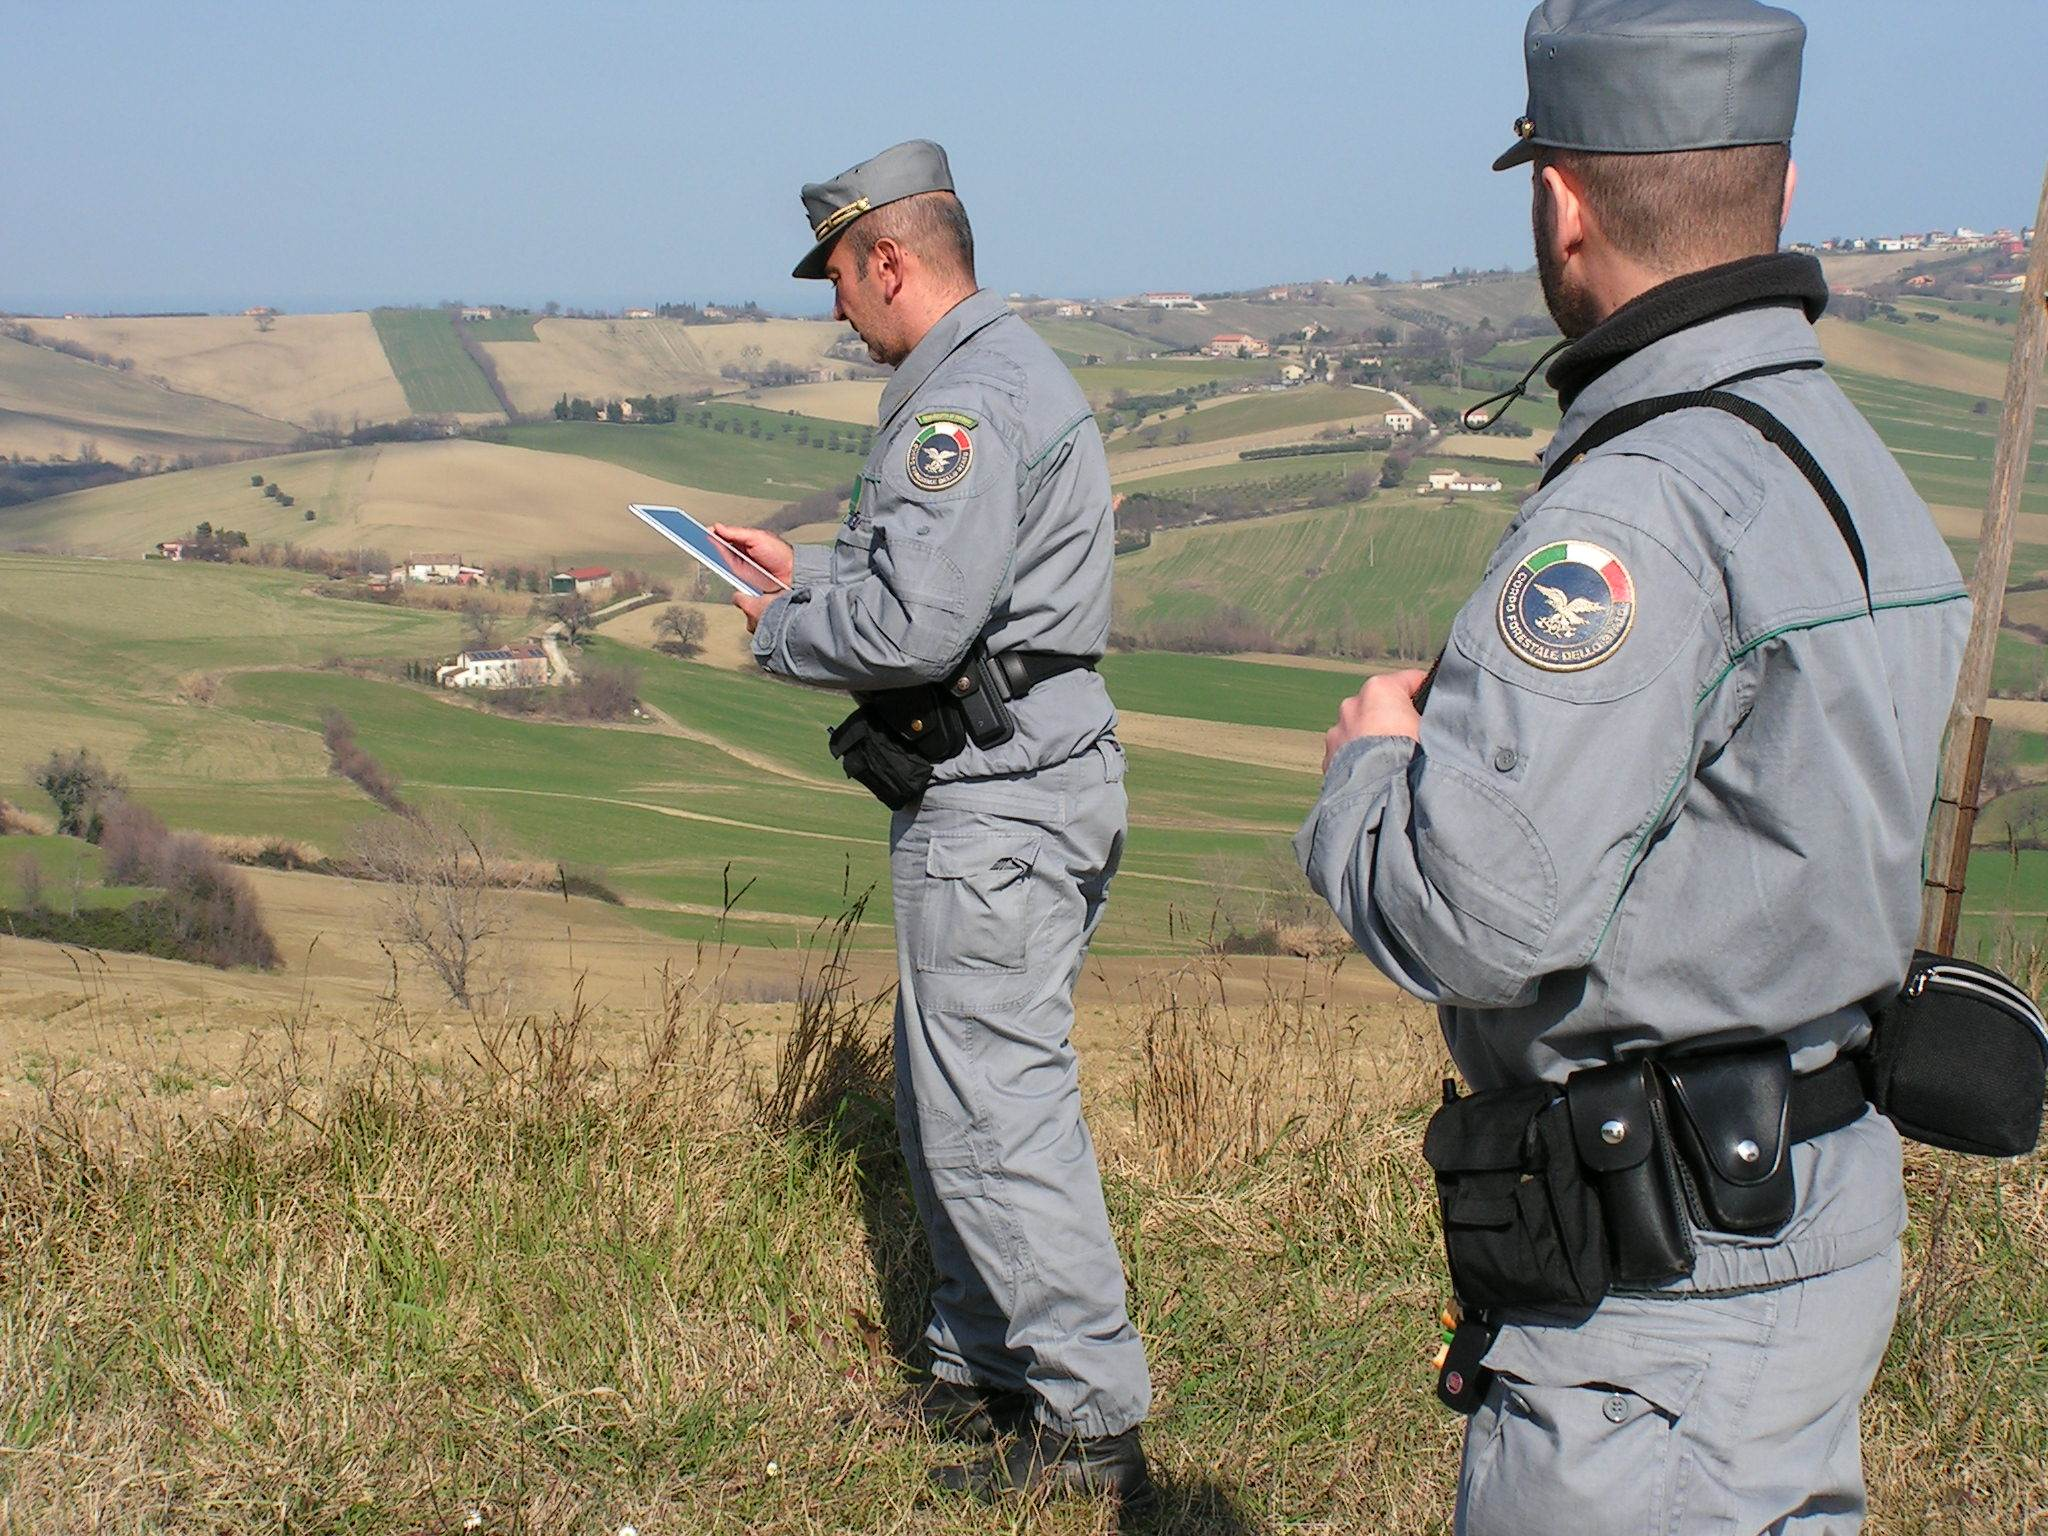 Traffico di rifiuti tra Puglia e Africa-Medio Oriente, in arresto tre imprenditori